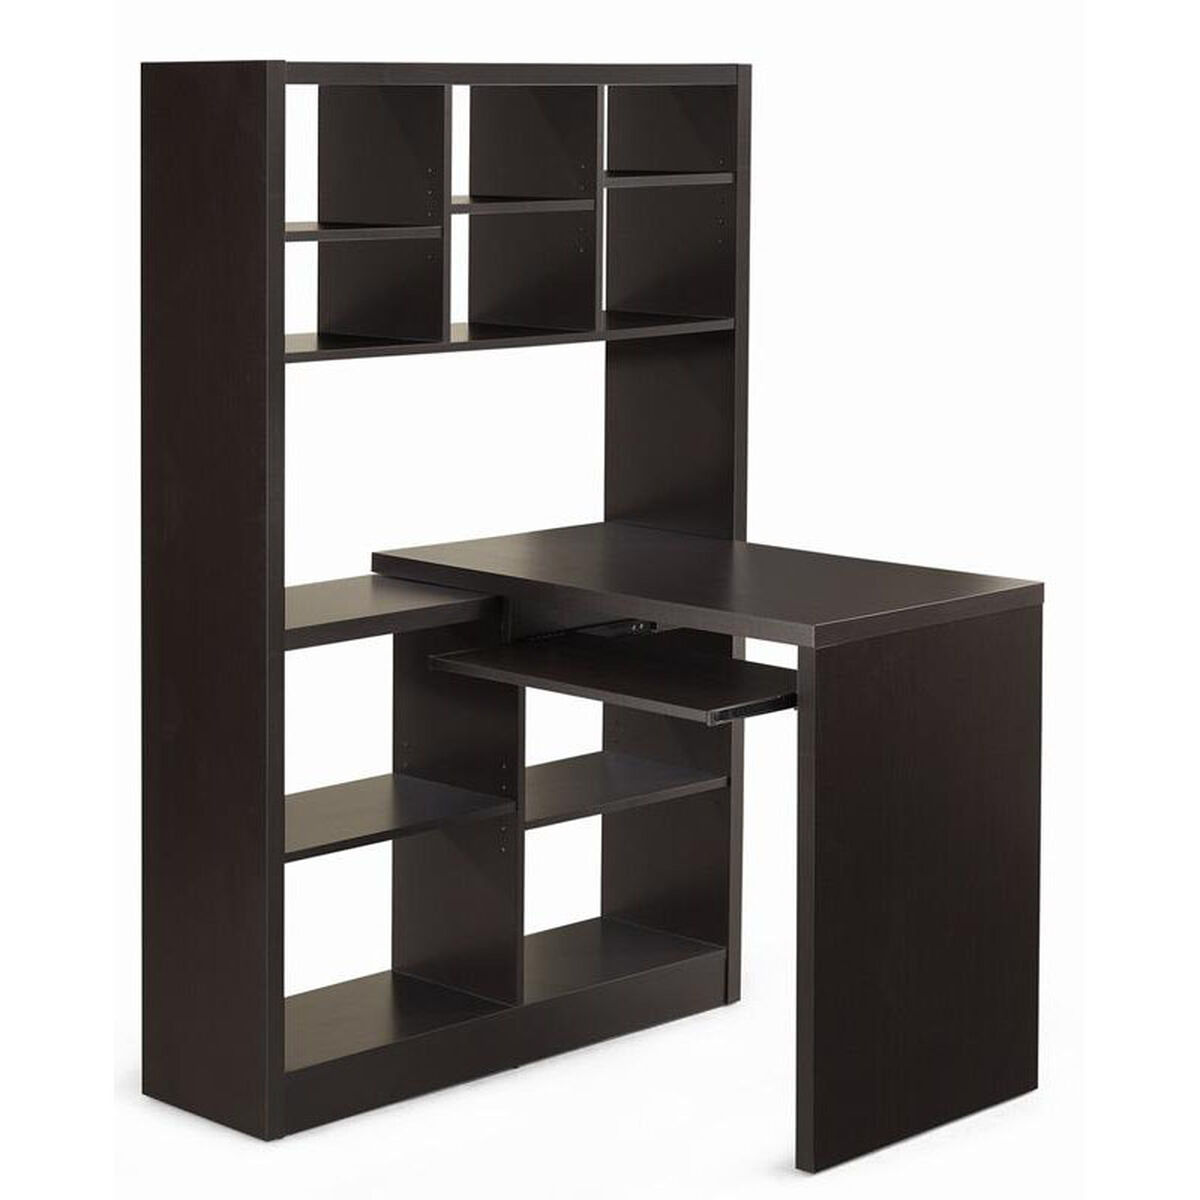 Image of: Office Corner Shelf Throughout Three Shelf Corner Bookcase pl161 Classic Series Bookcases